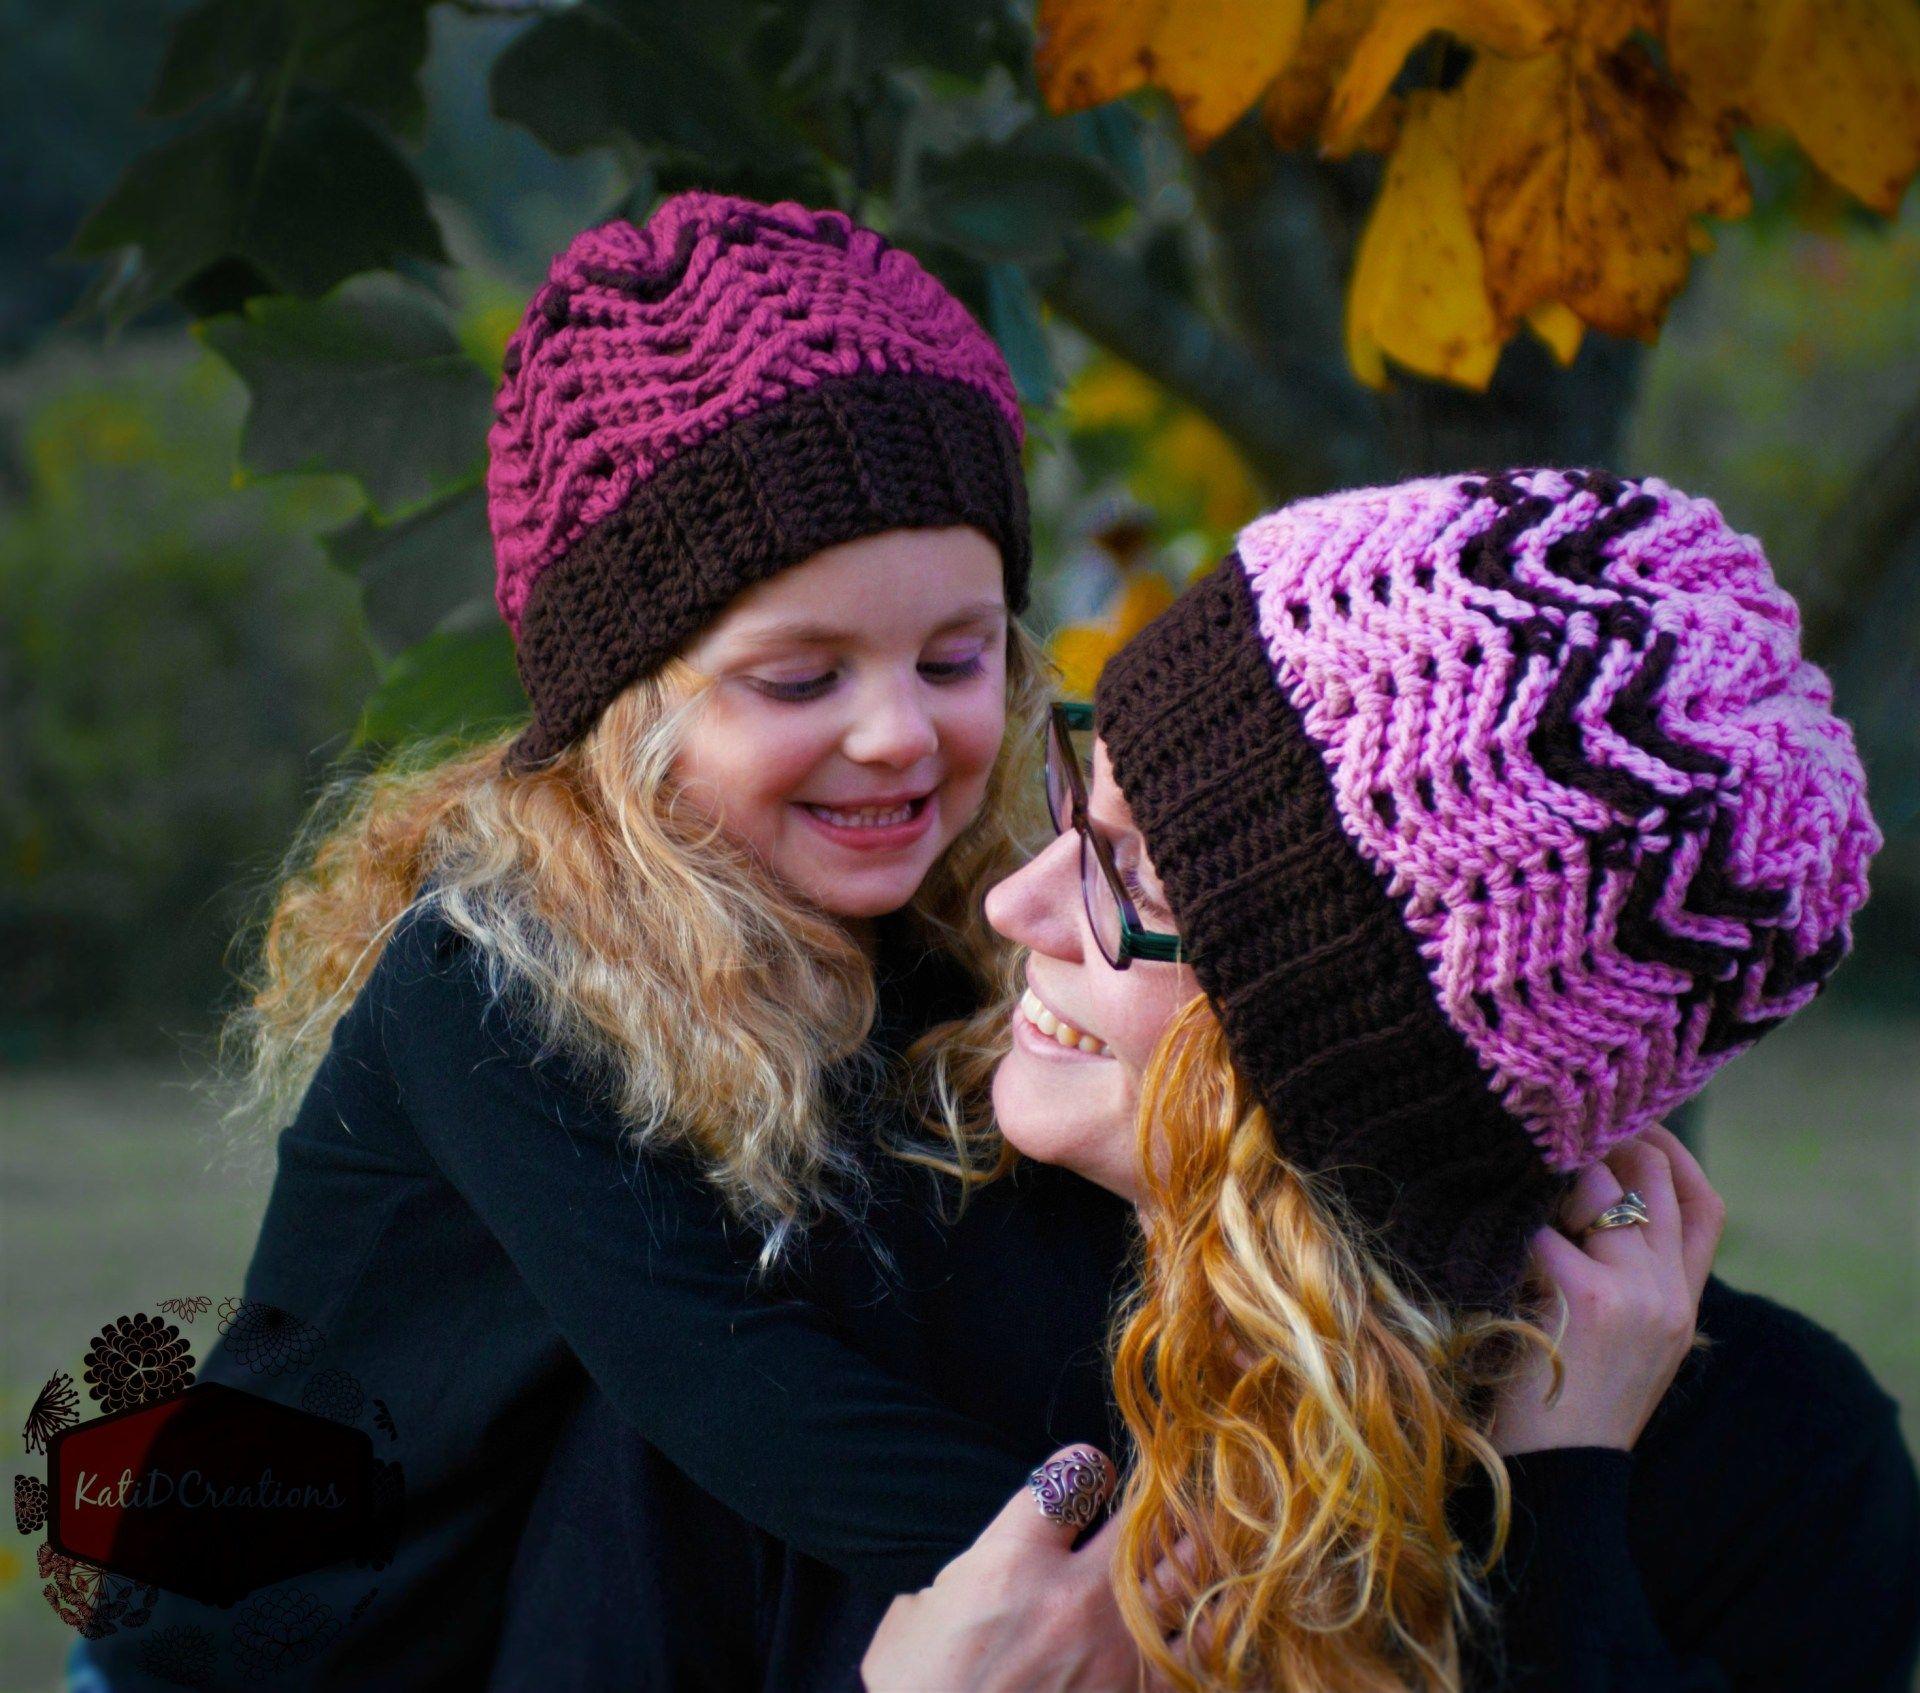 Chevron Beanie - free crochet pattern at KatiDCreations. | DIY3 ...